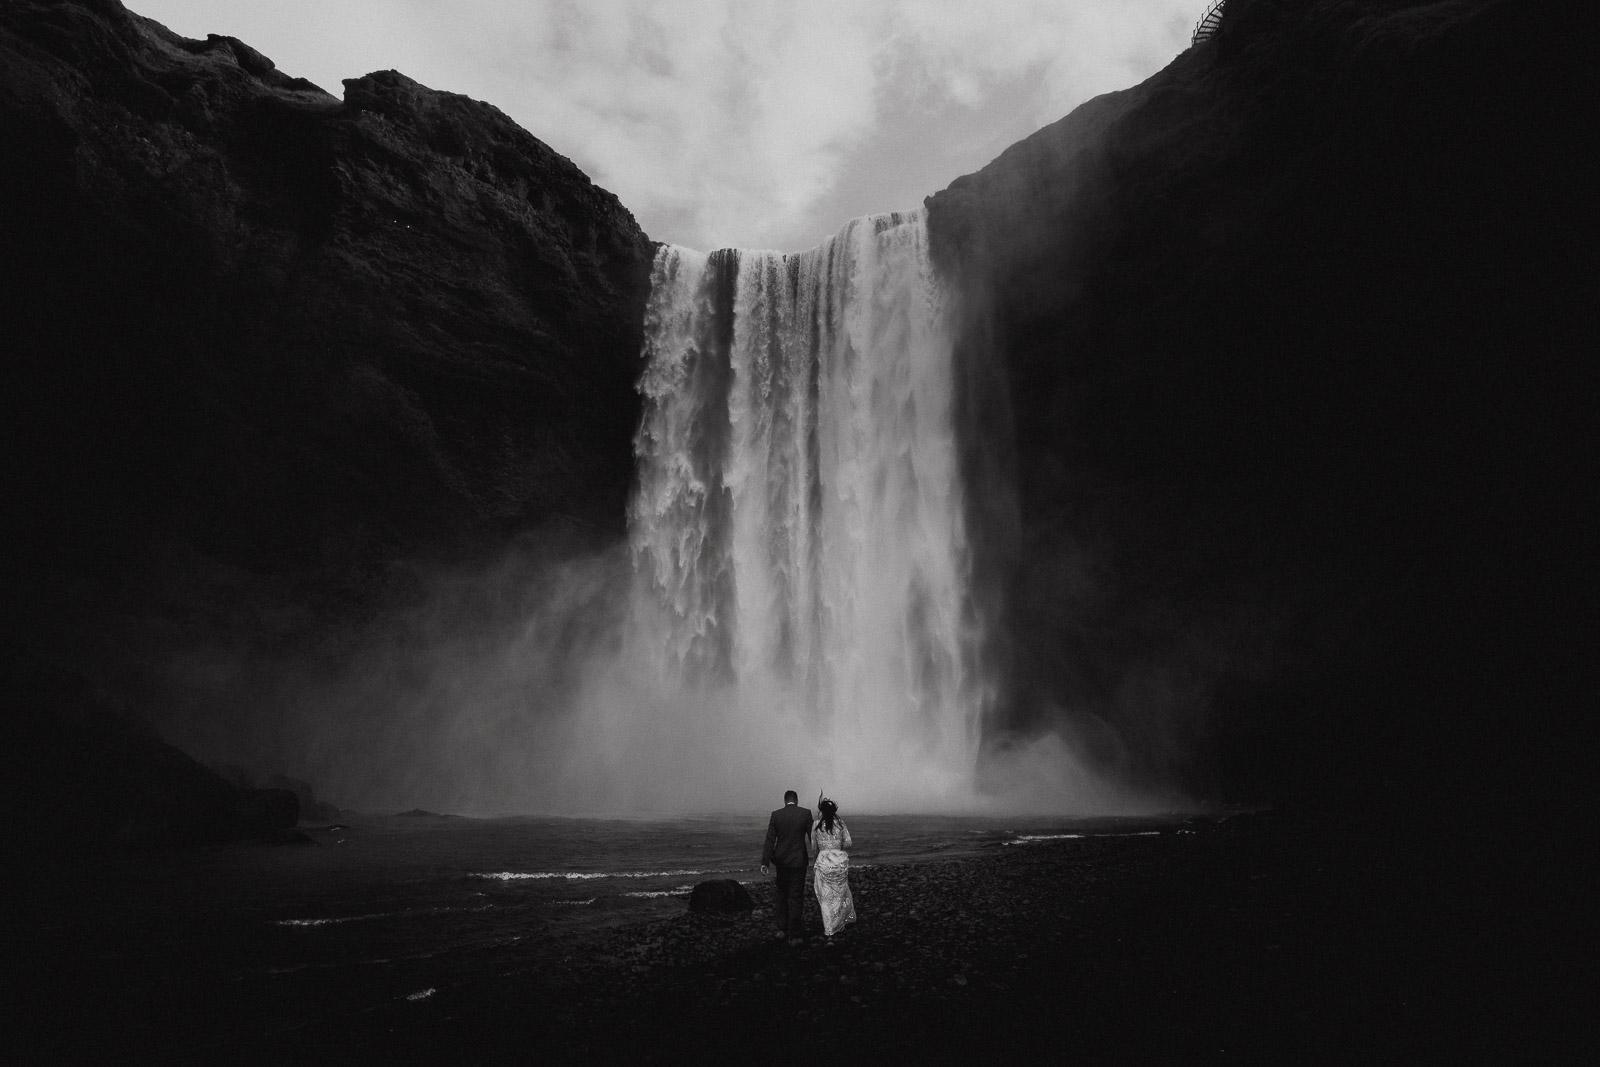 Best-of-weddings-2016-m&j-studios-Mait-Juriado-008